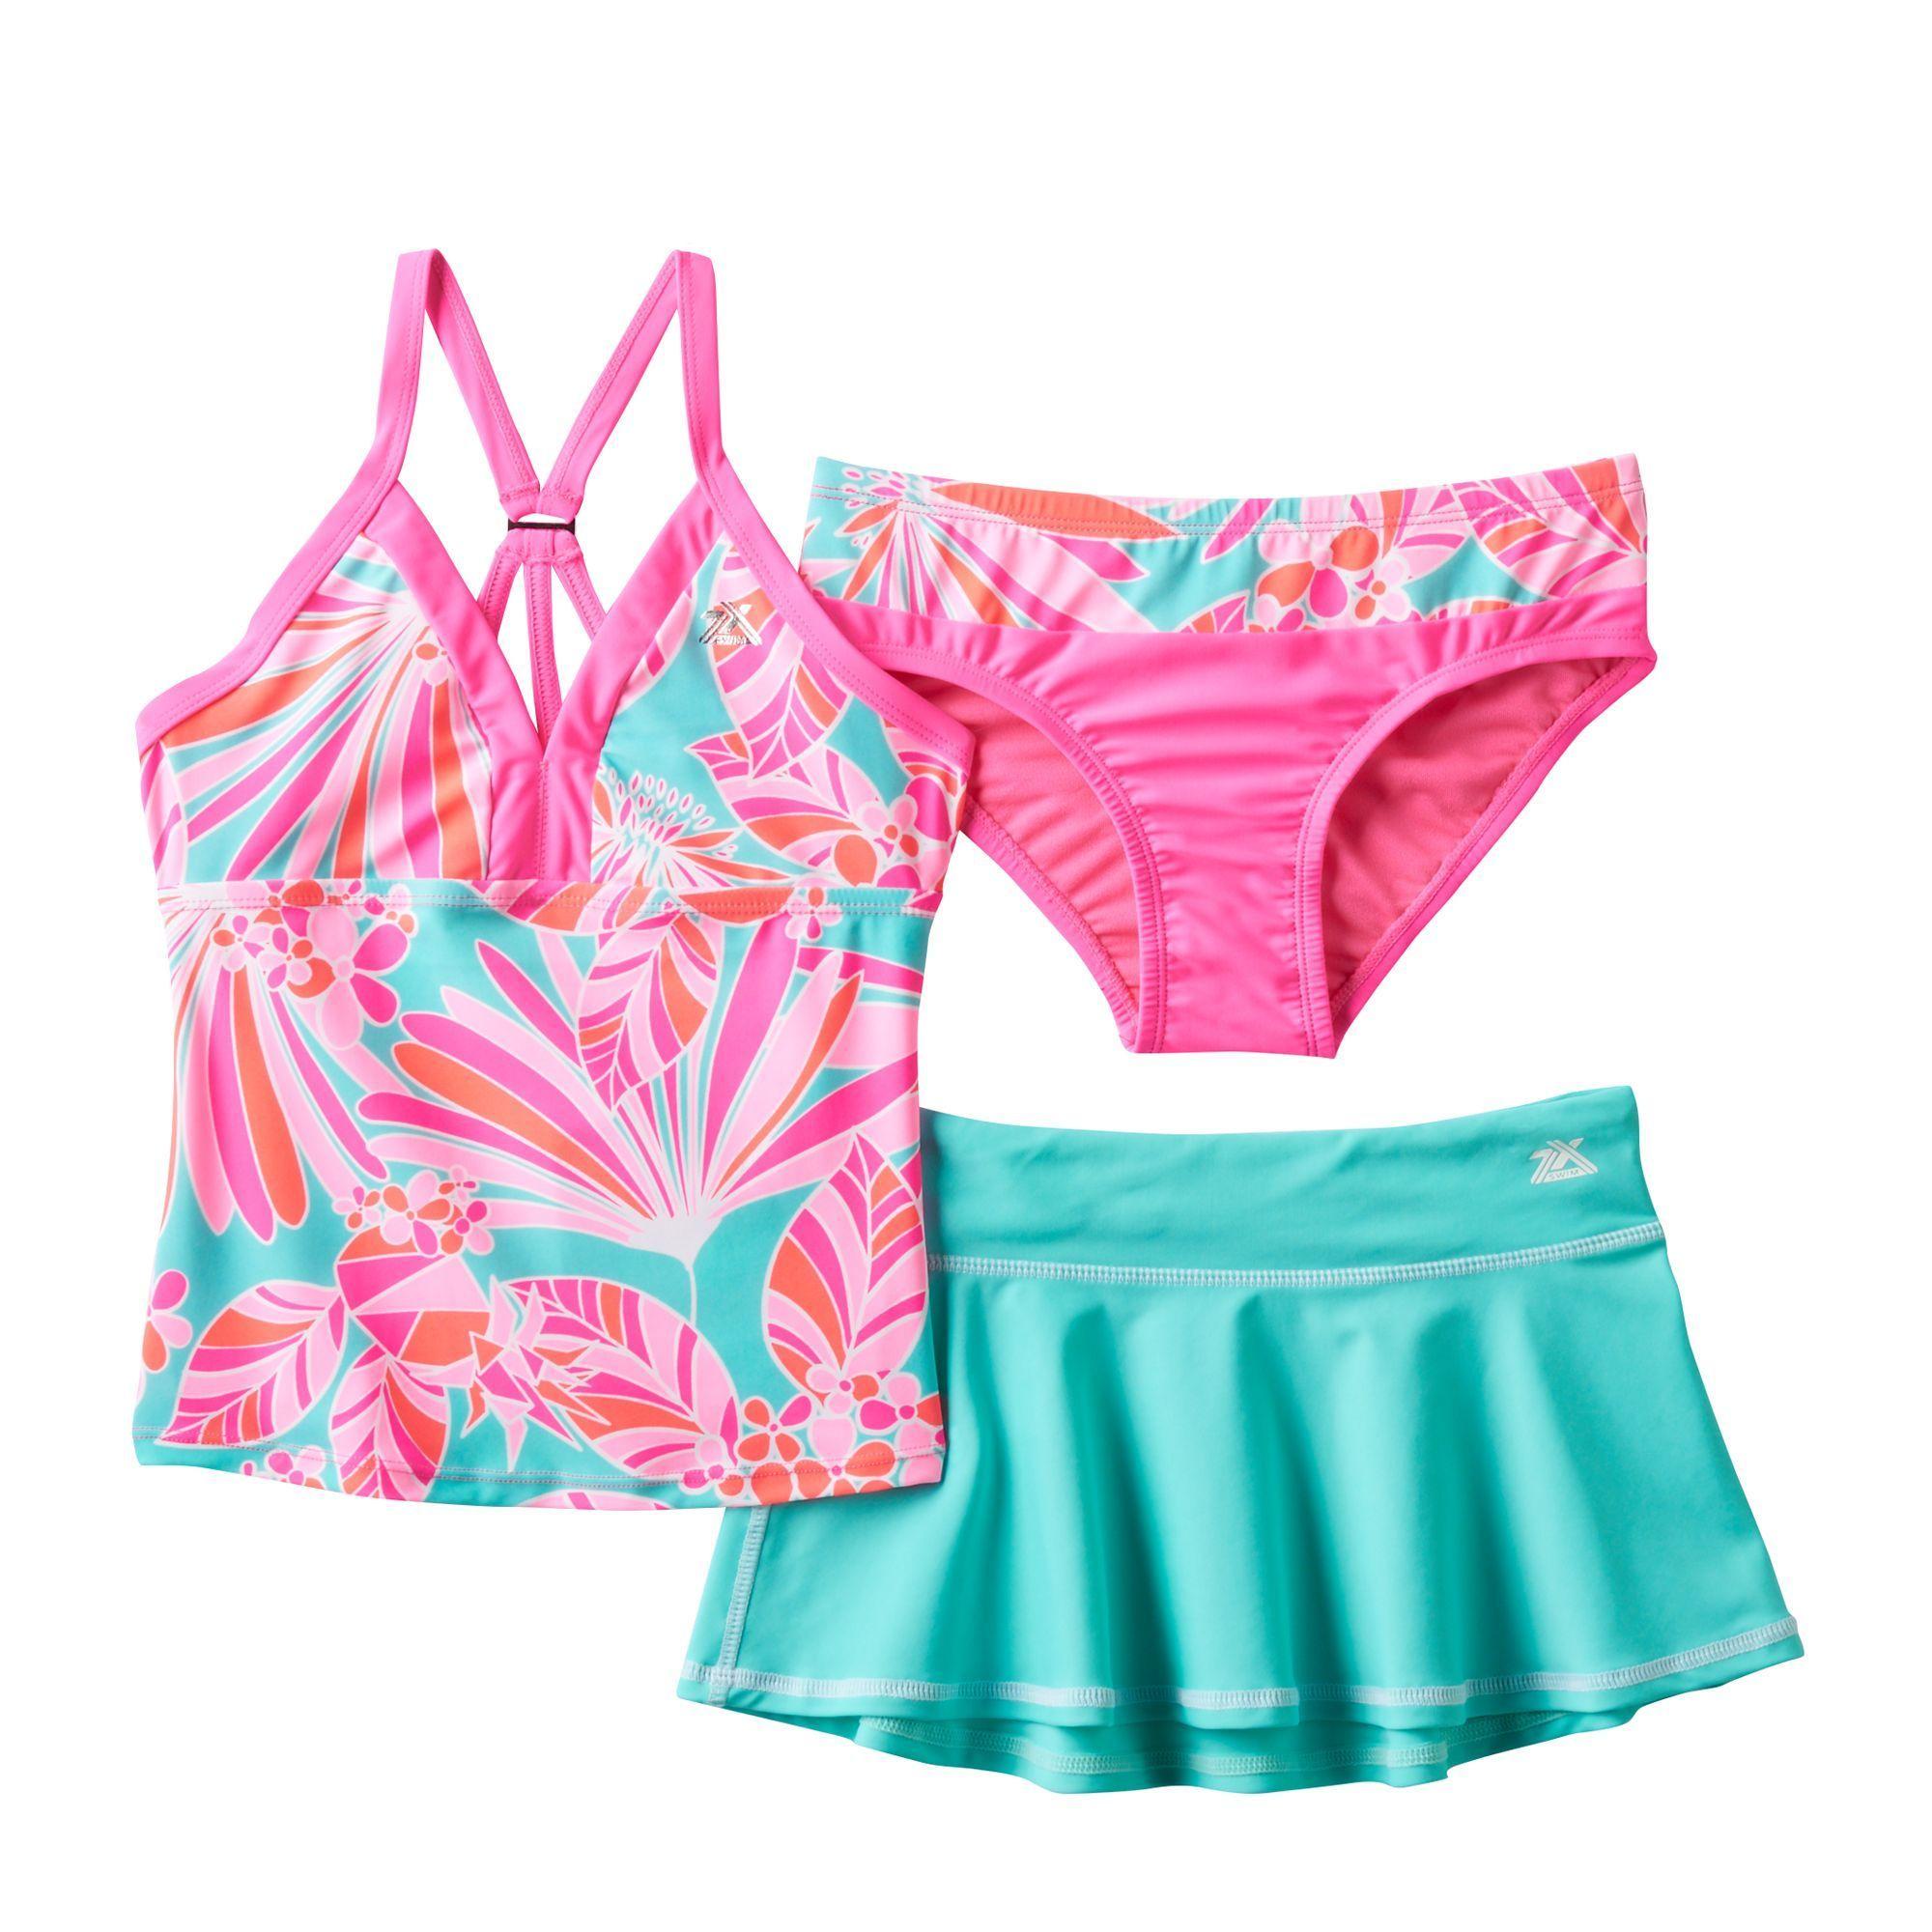 9378141ab5a66 Girls 7-16 ZeroXposur 3-pc. Fantasia Tankini Swimsuit Set, Girl's, Size:  12, Med Pink